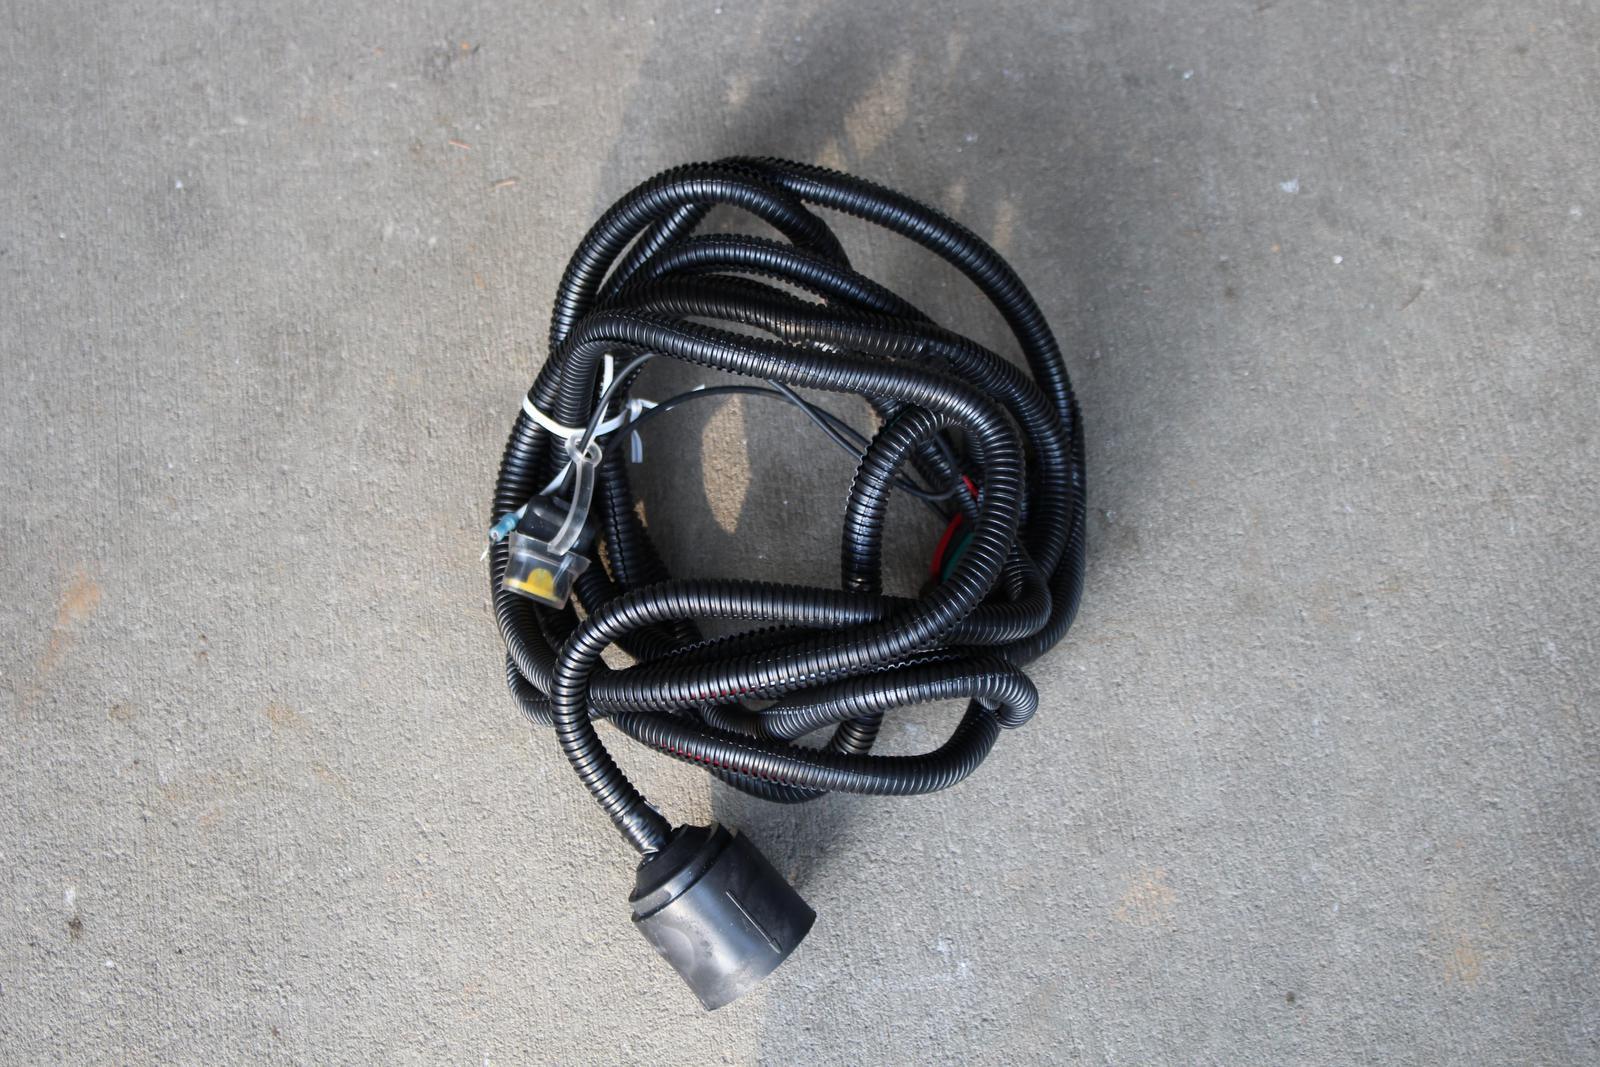 medium resolution of 15680 meyer oem slik stik wiring harness meyer products